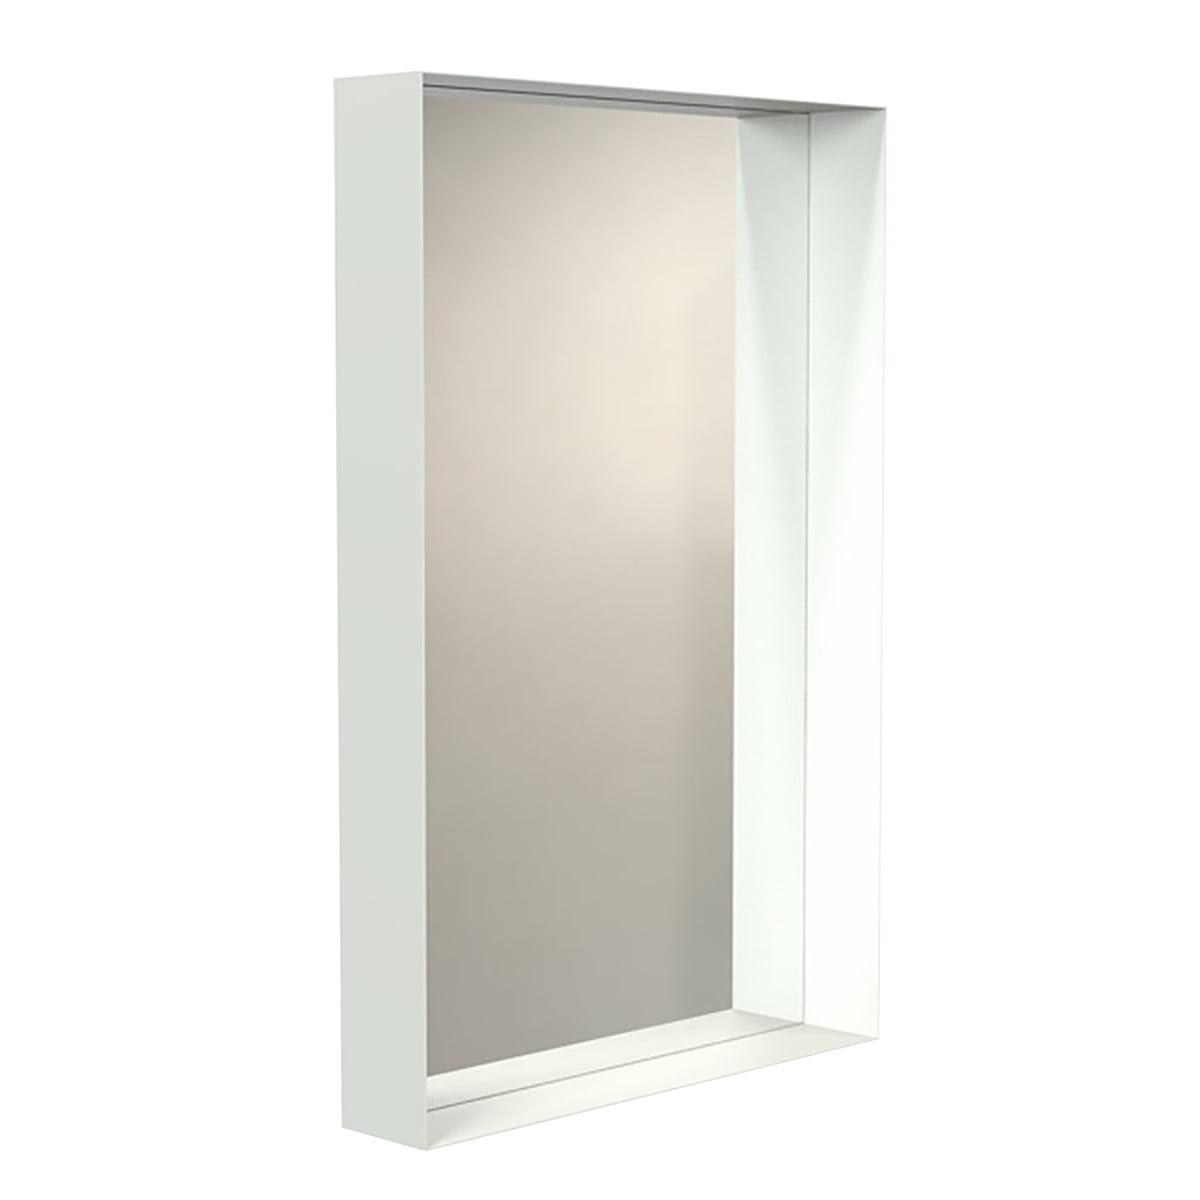 Miroir mural unu avec cadre de frost connox for Miroir mural sans cadre